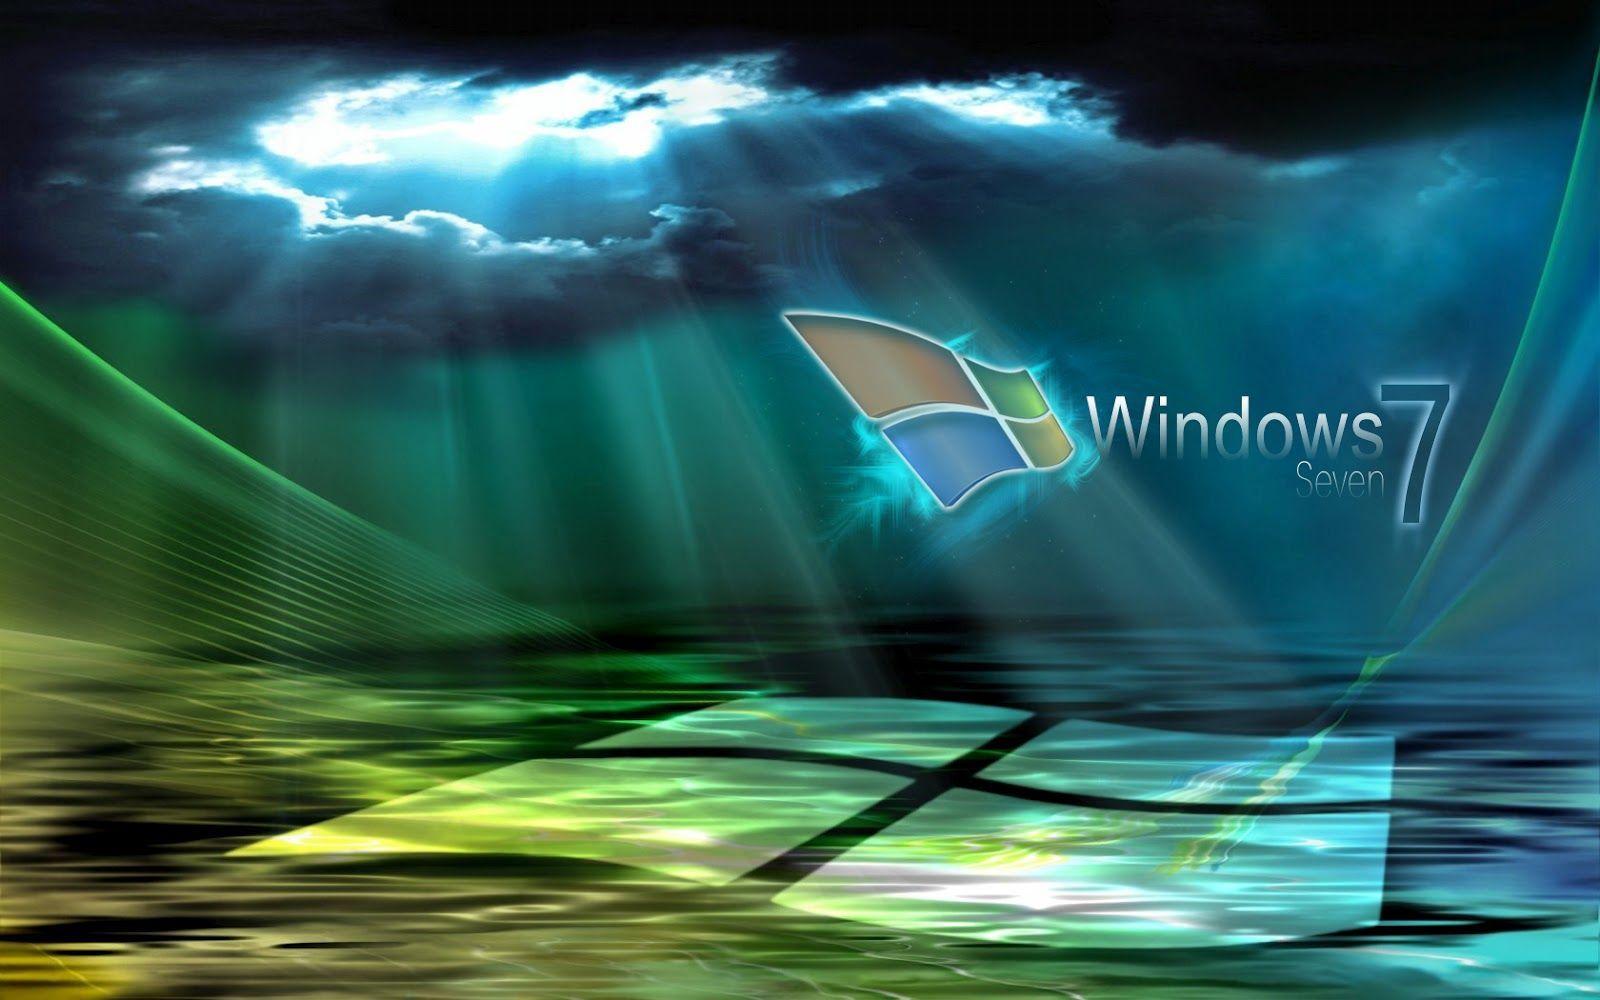 3d live wallpaper windows 7 free download